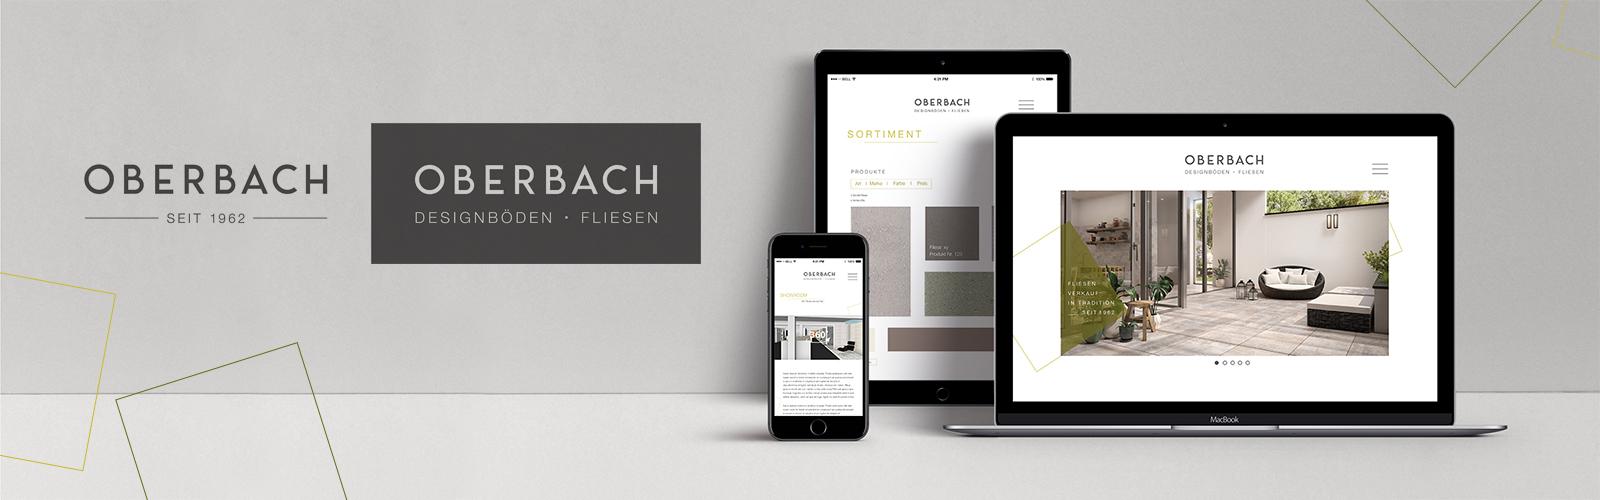 Braunwagner Communication Design Oberbach Corporate Design 2018